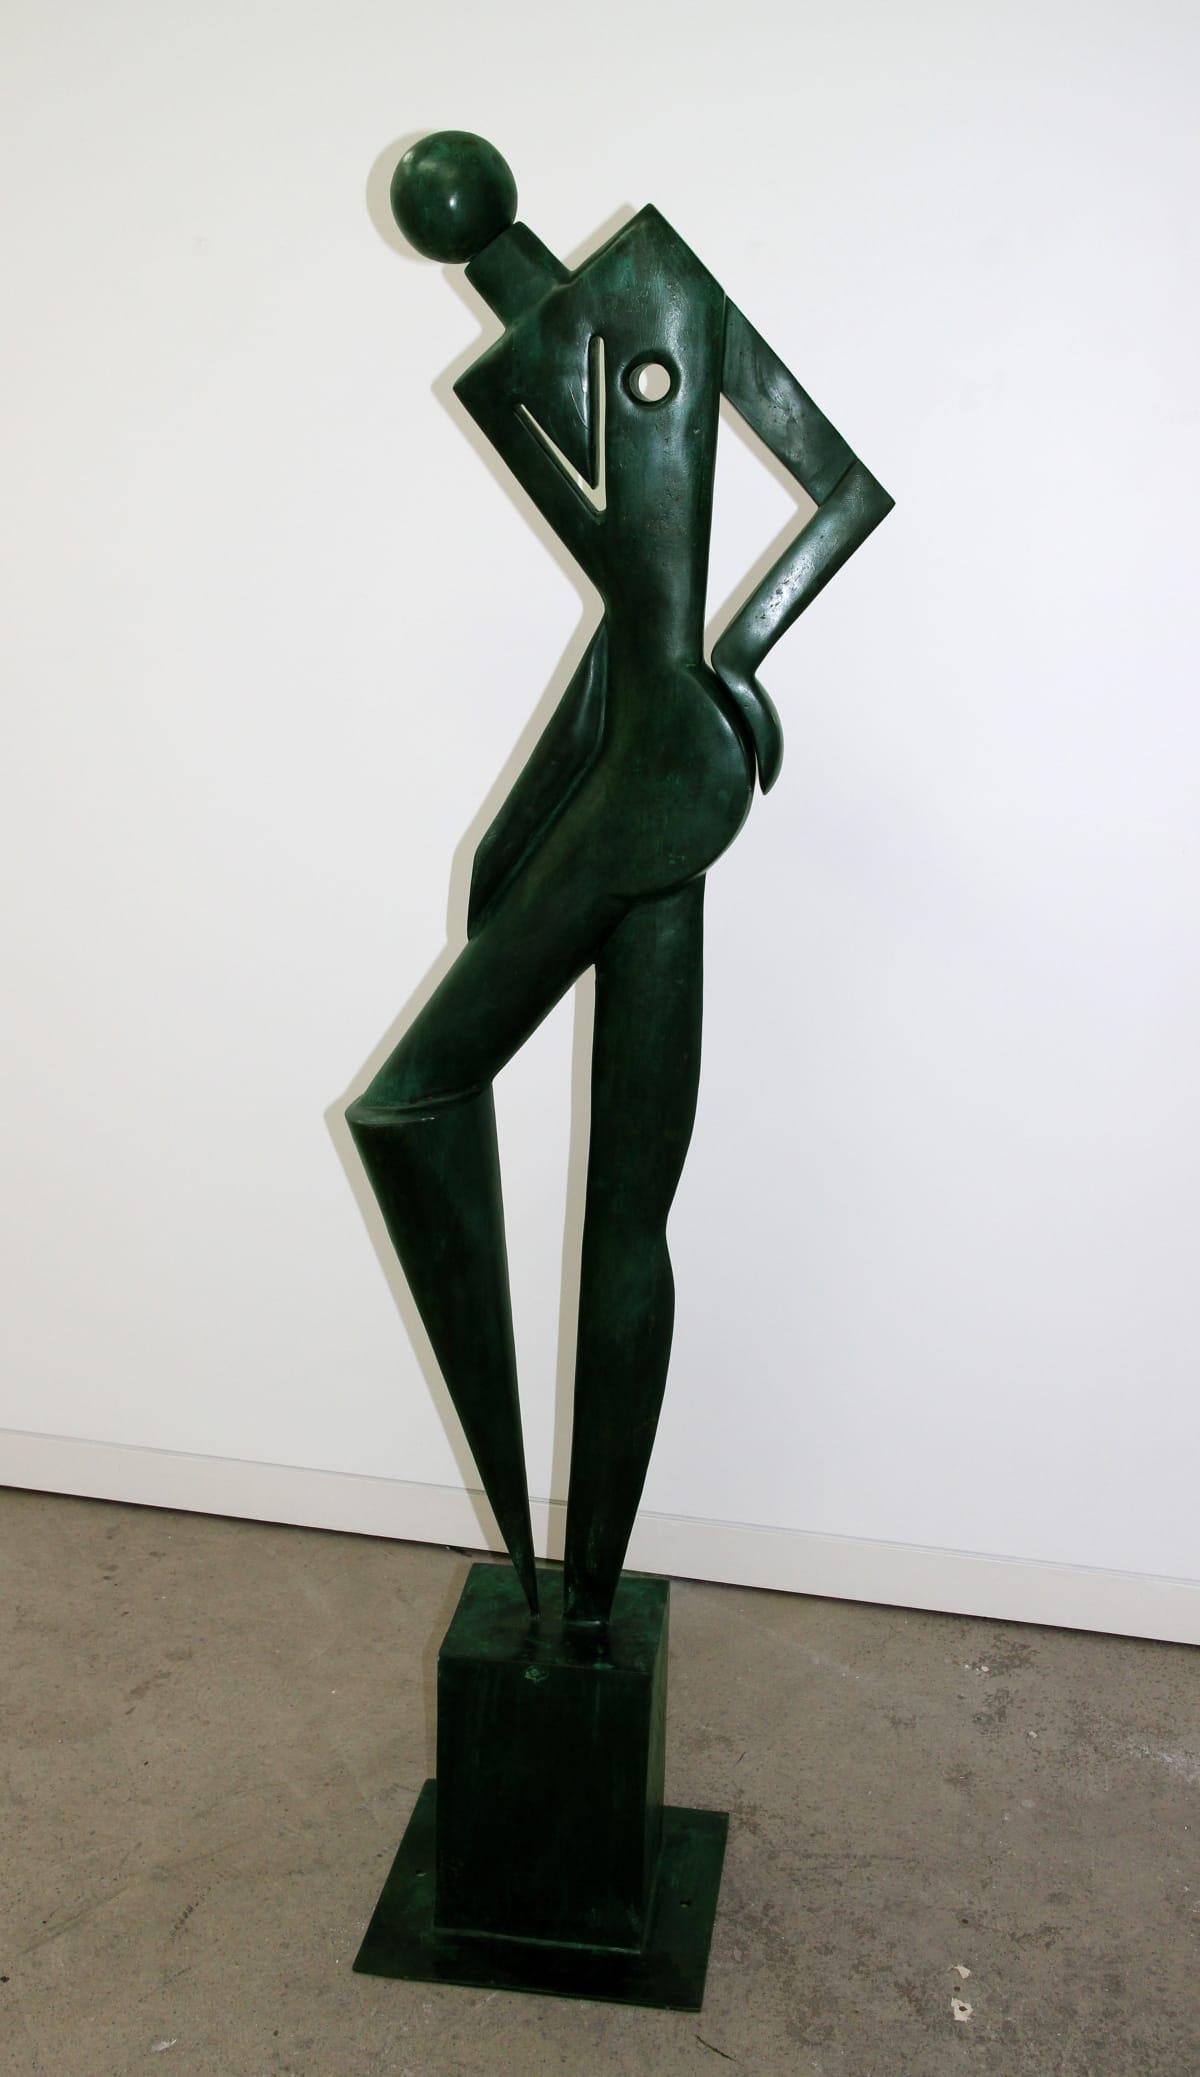 Paul DIBBLE Figure Observing, 1/2, 2014 Cast Patinated Bronze 78.7 x 14.6 x 13.4 in 200 x 37 x 34 cm